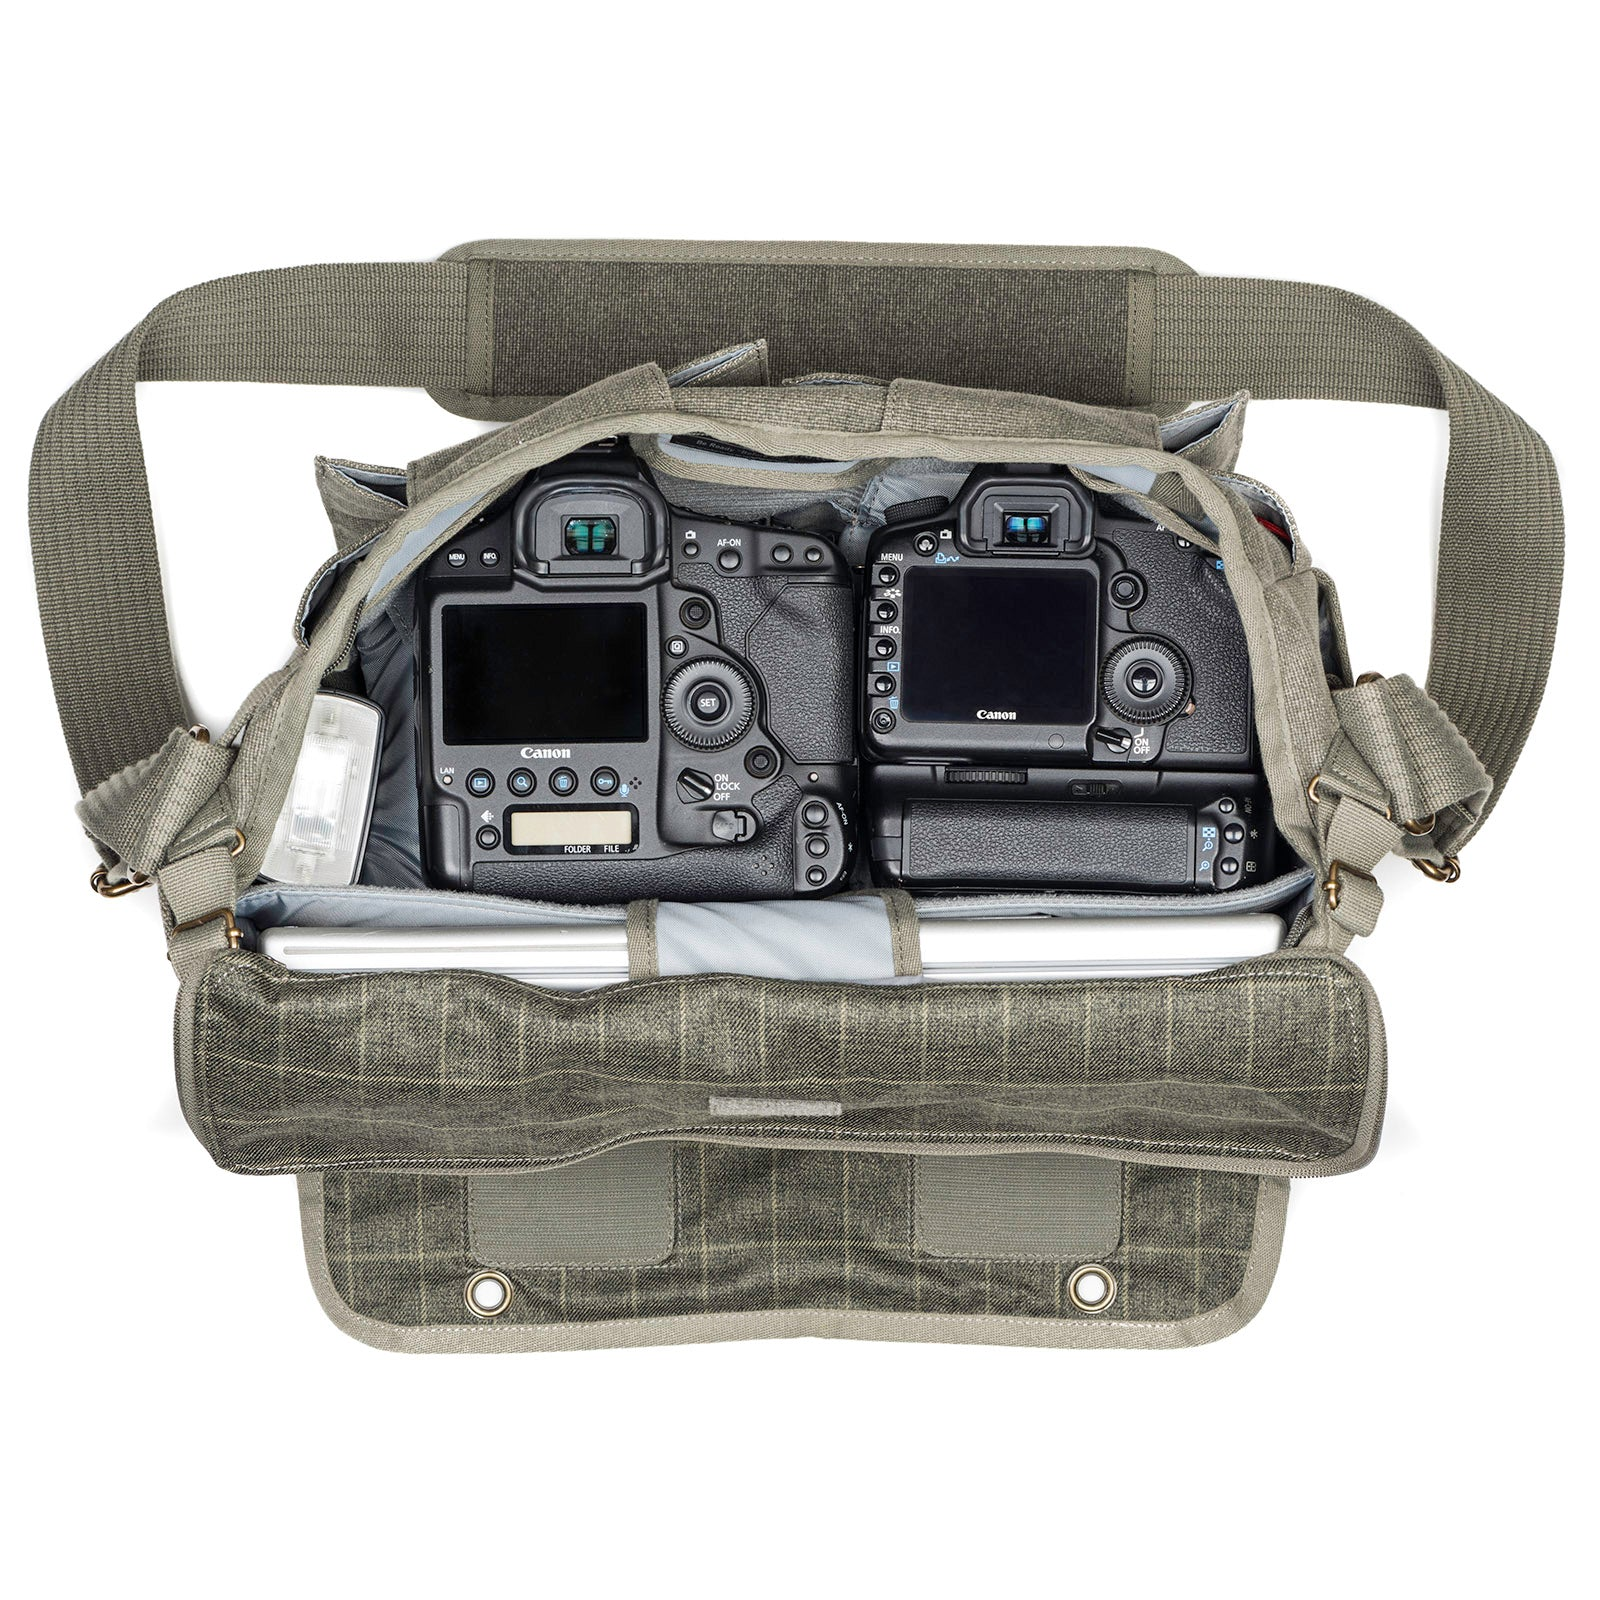 https://cdn.shopify.com/s/files/1/0532/0233/products/Retrospective-30-V2-Canon-294.jpg